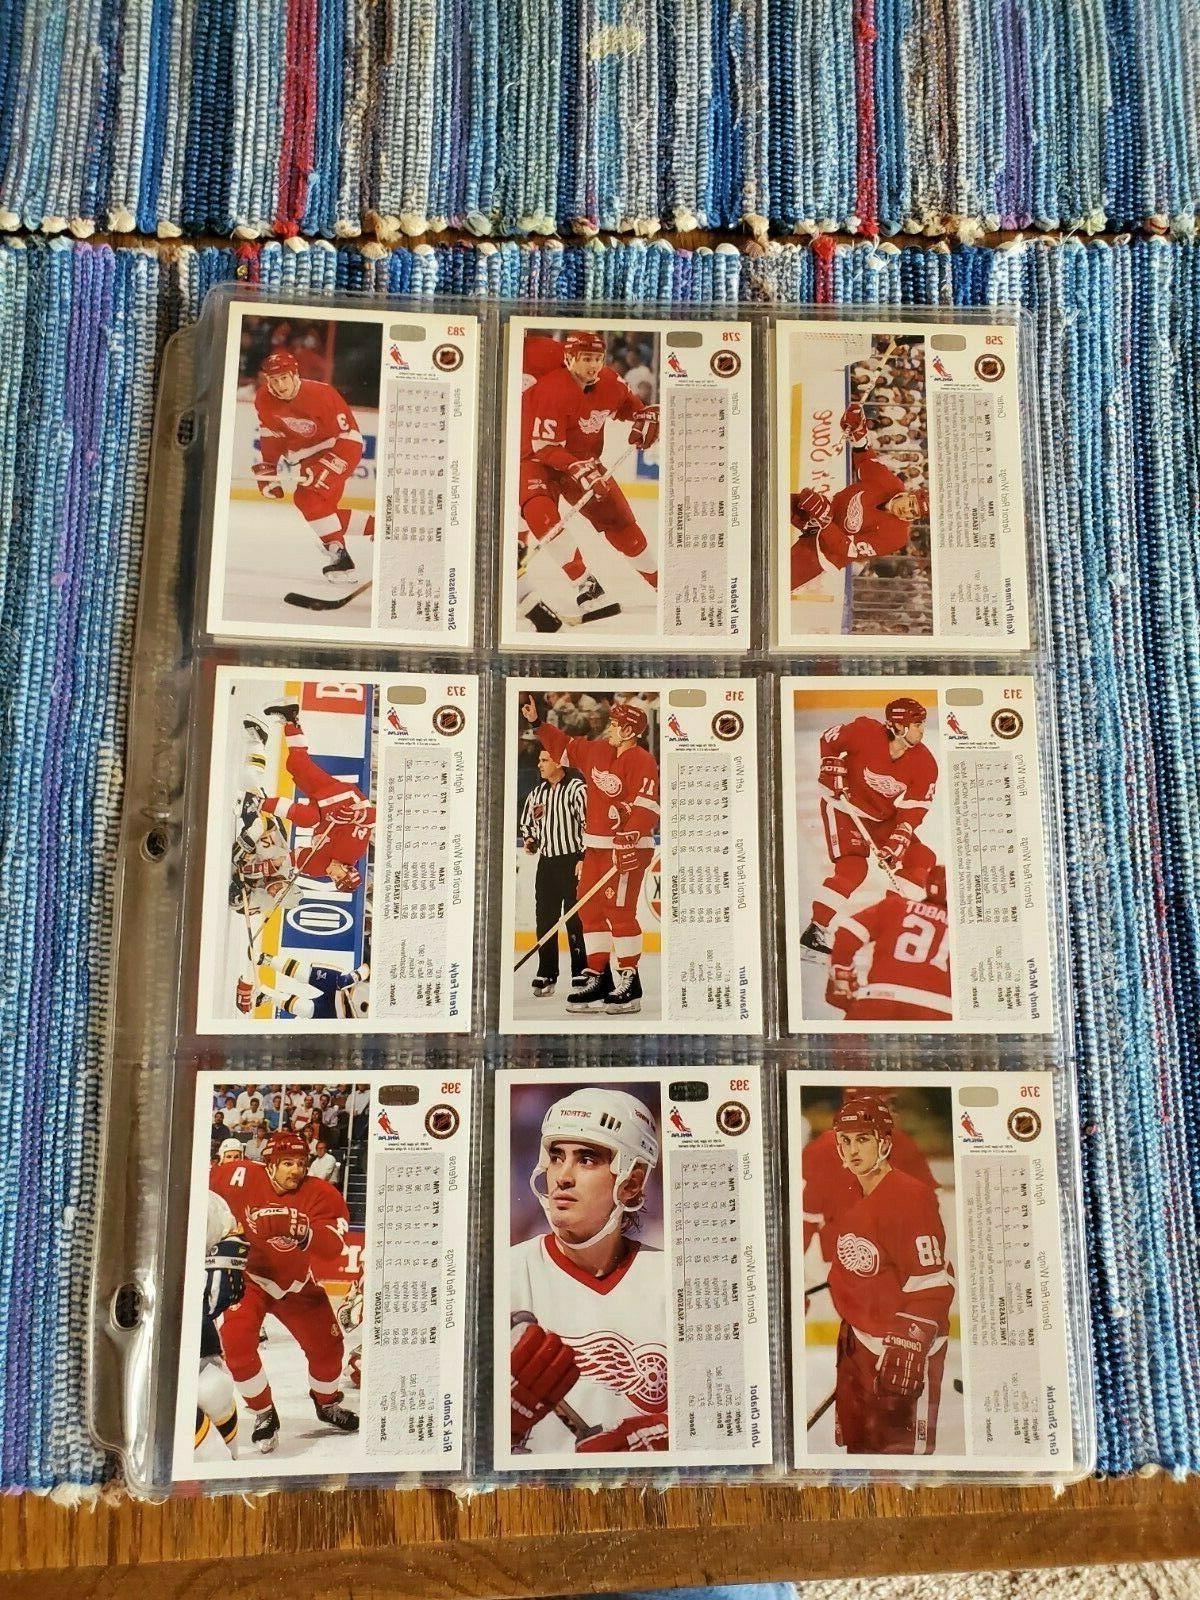 1991-92 Red Wings Hockey Mint cards in sleeves